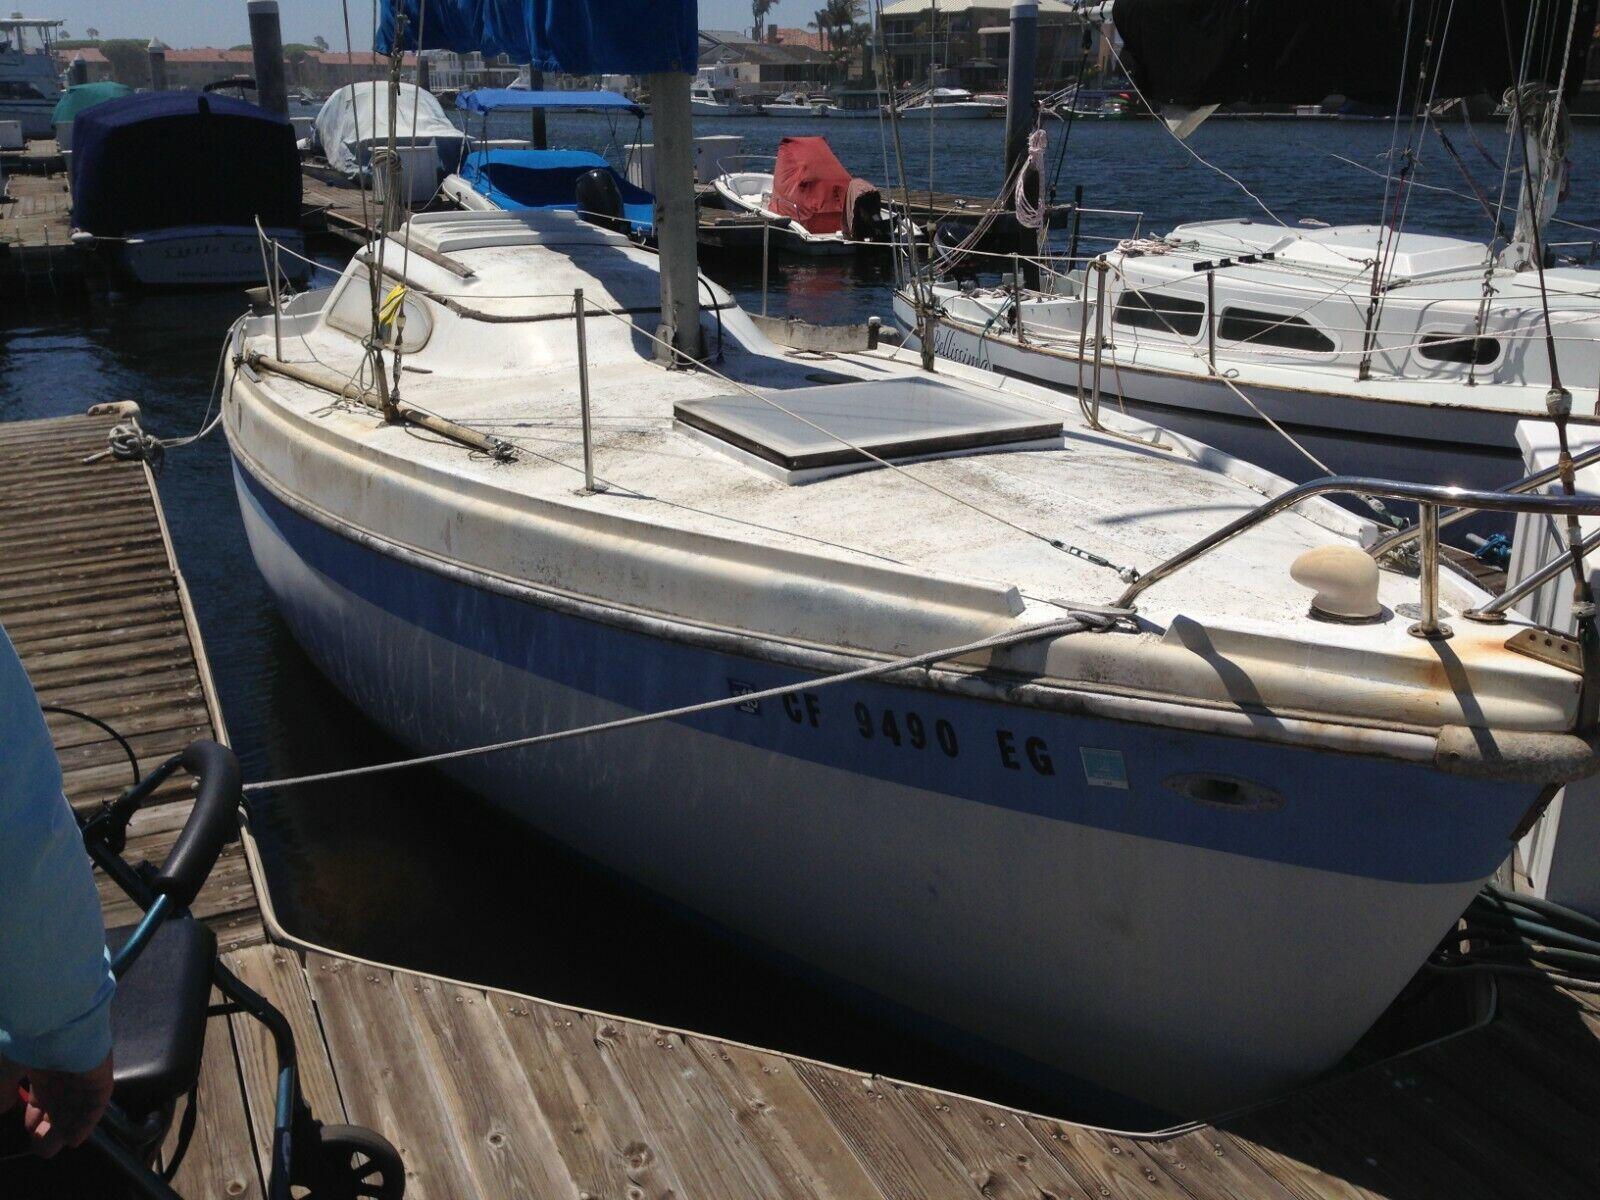 1969 Columbia 26' Sloop Sailboat - Inflatable Dinghy - California